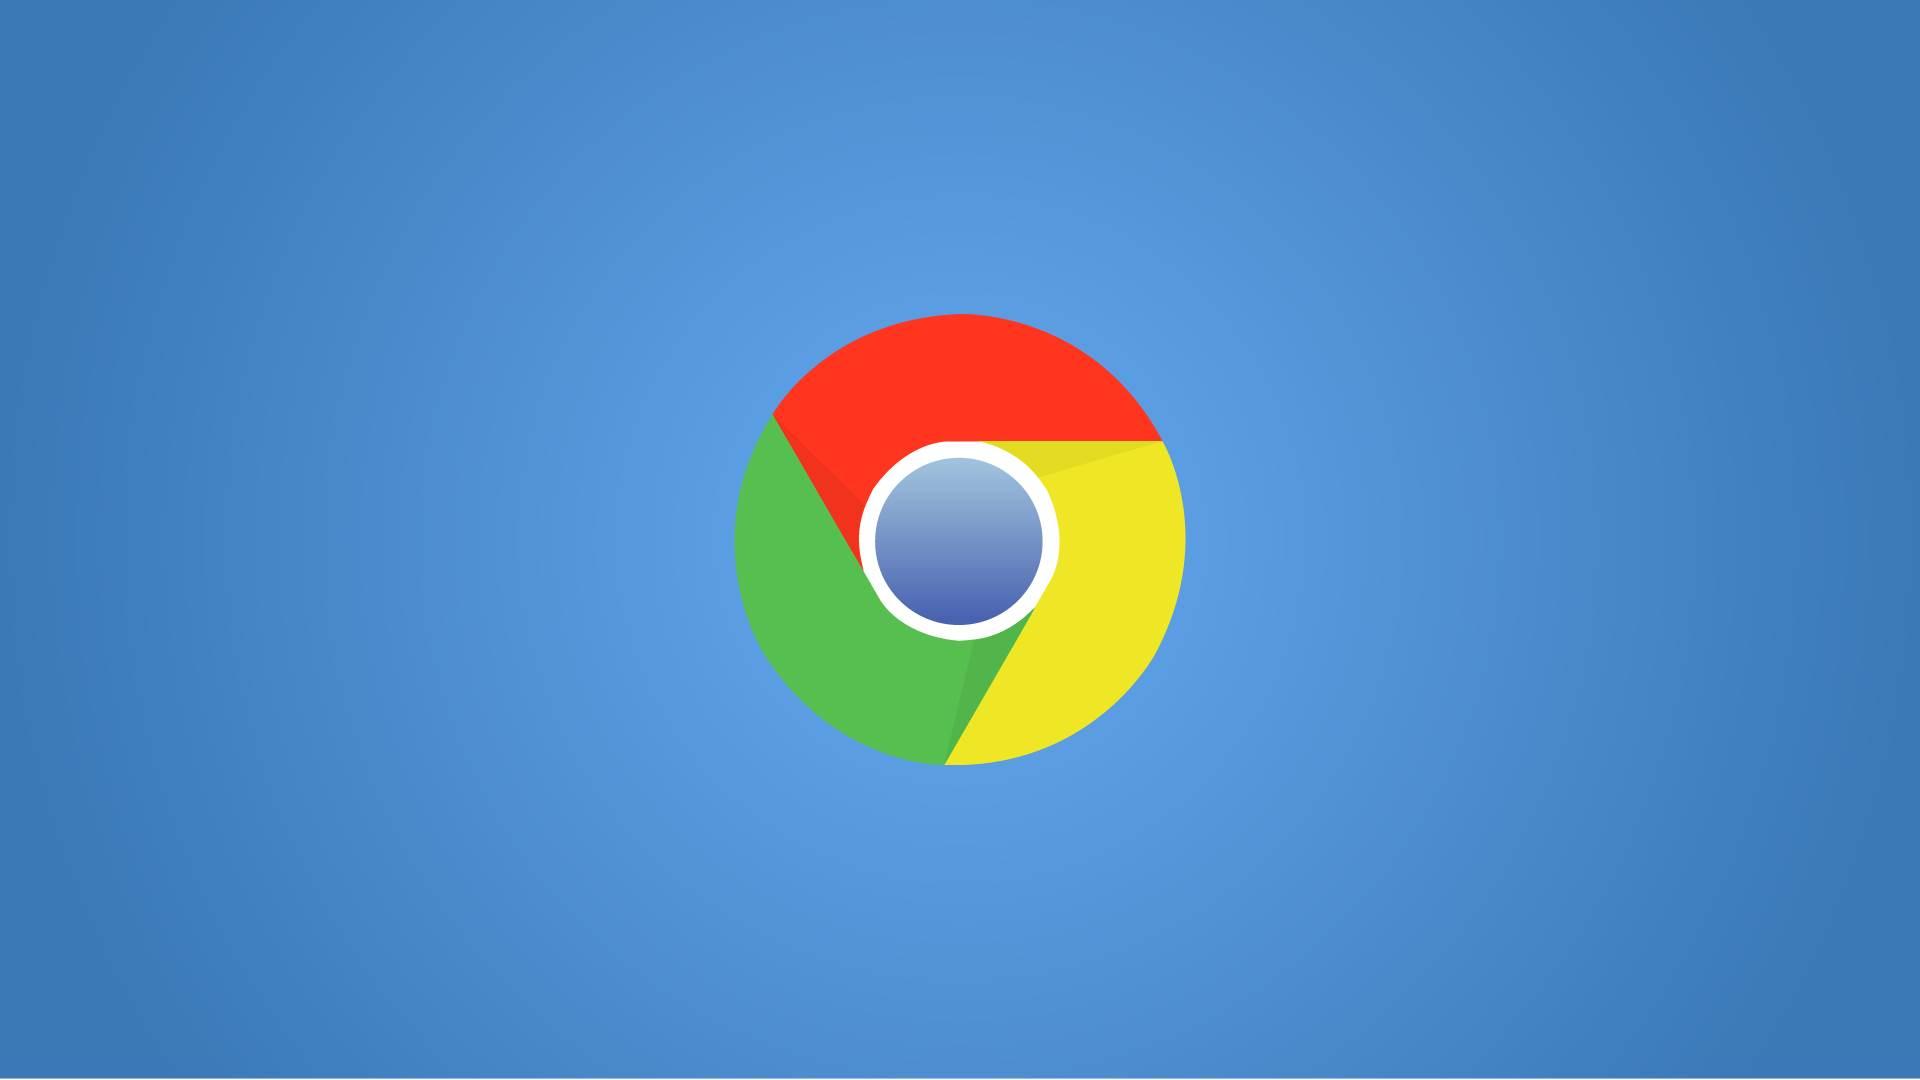 Chrome Web Store Themes 1920x1080